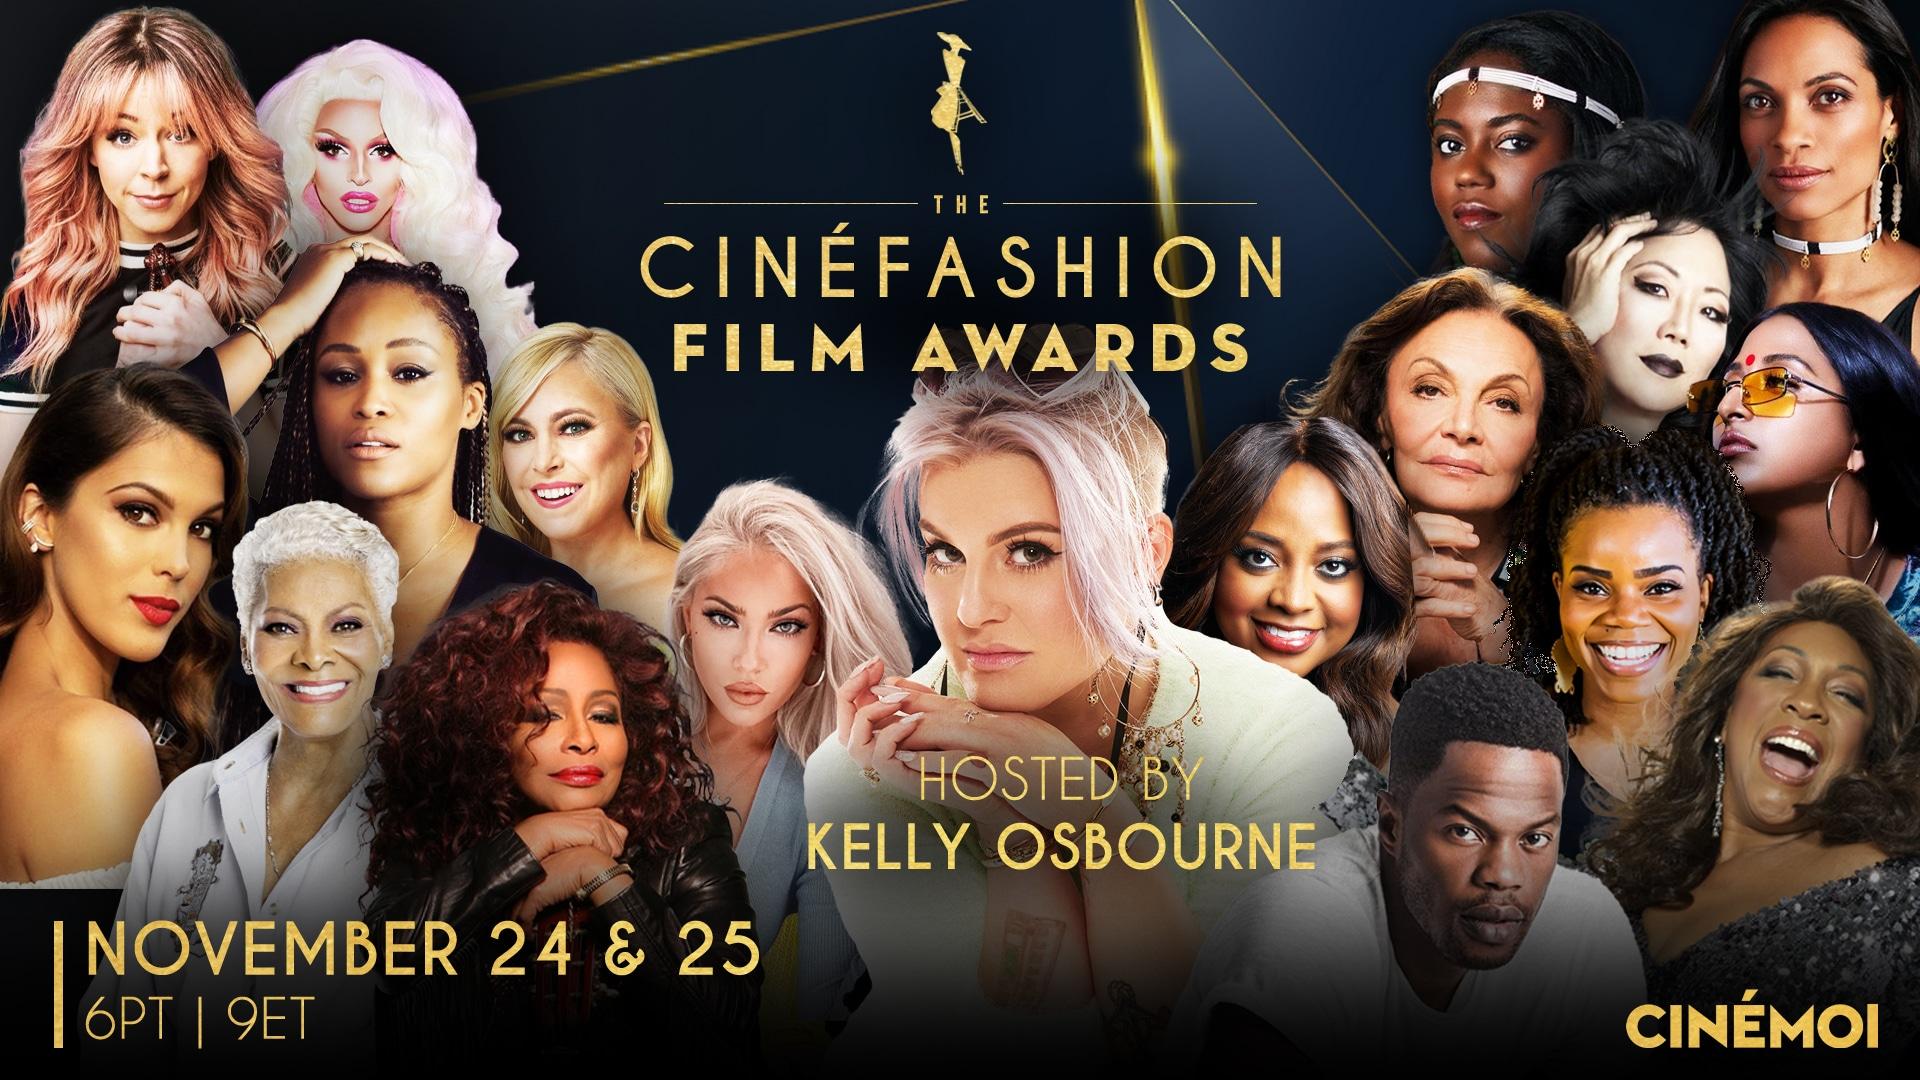 The 2020 CinéFashion Film Awards hosted by Kelly Osbourne